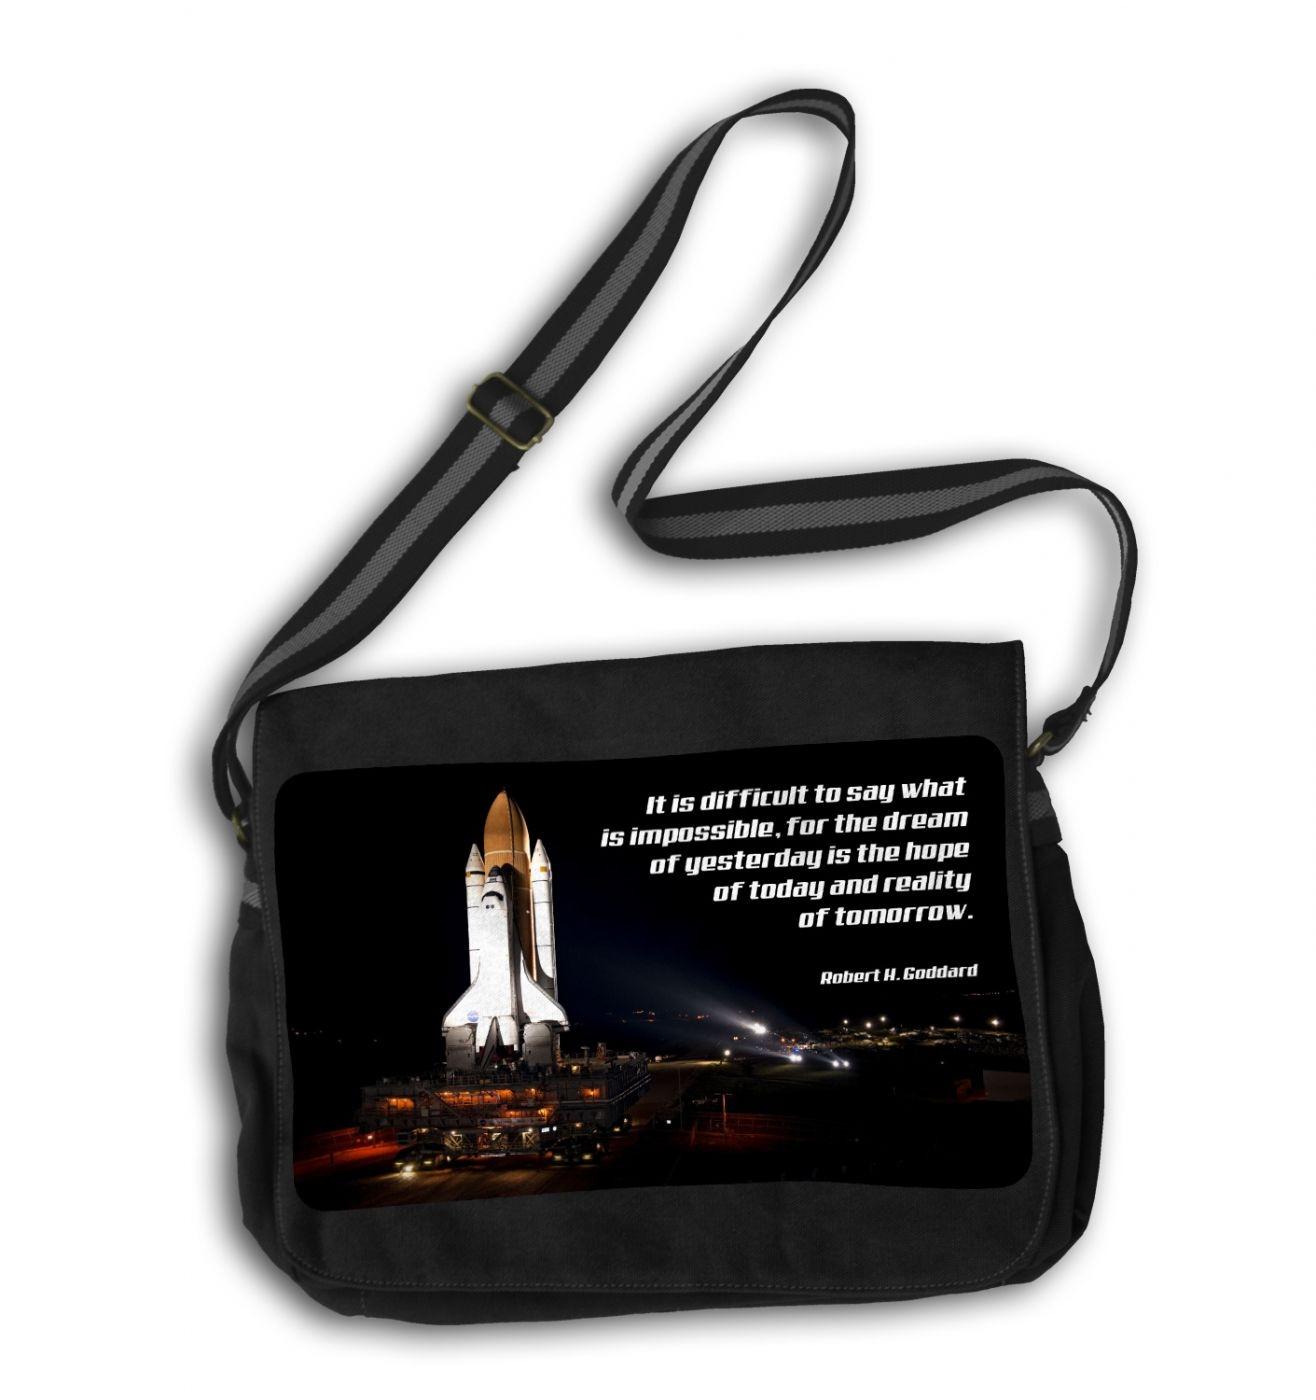 Space Shuttle messenger bag - geeky school bag